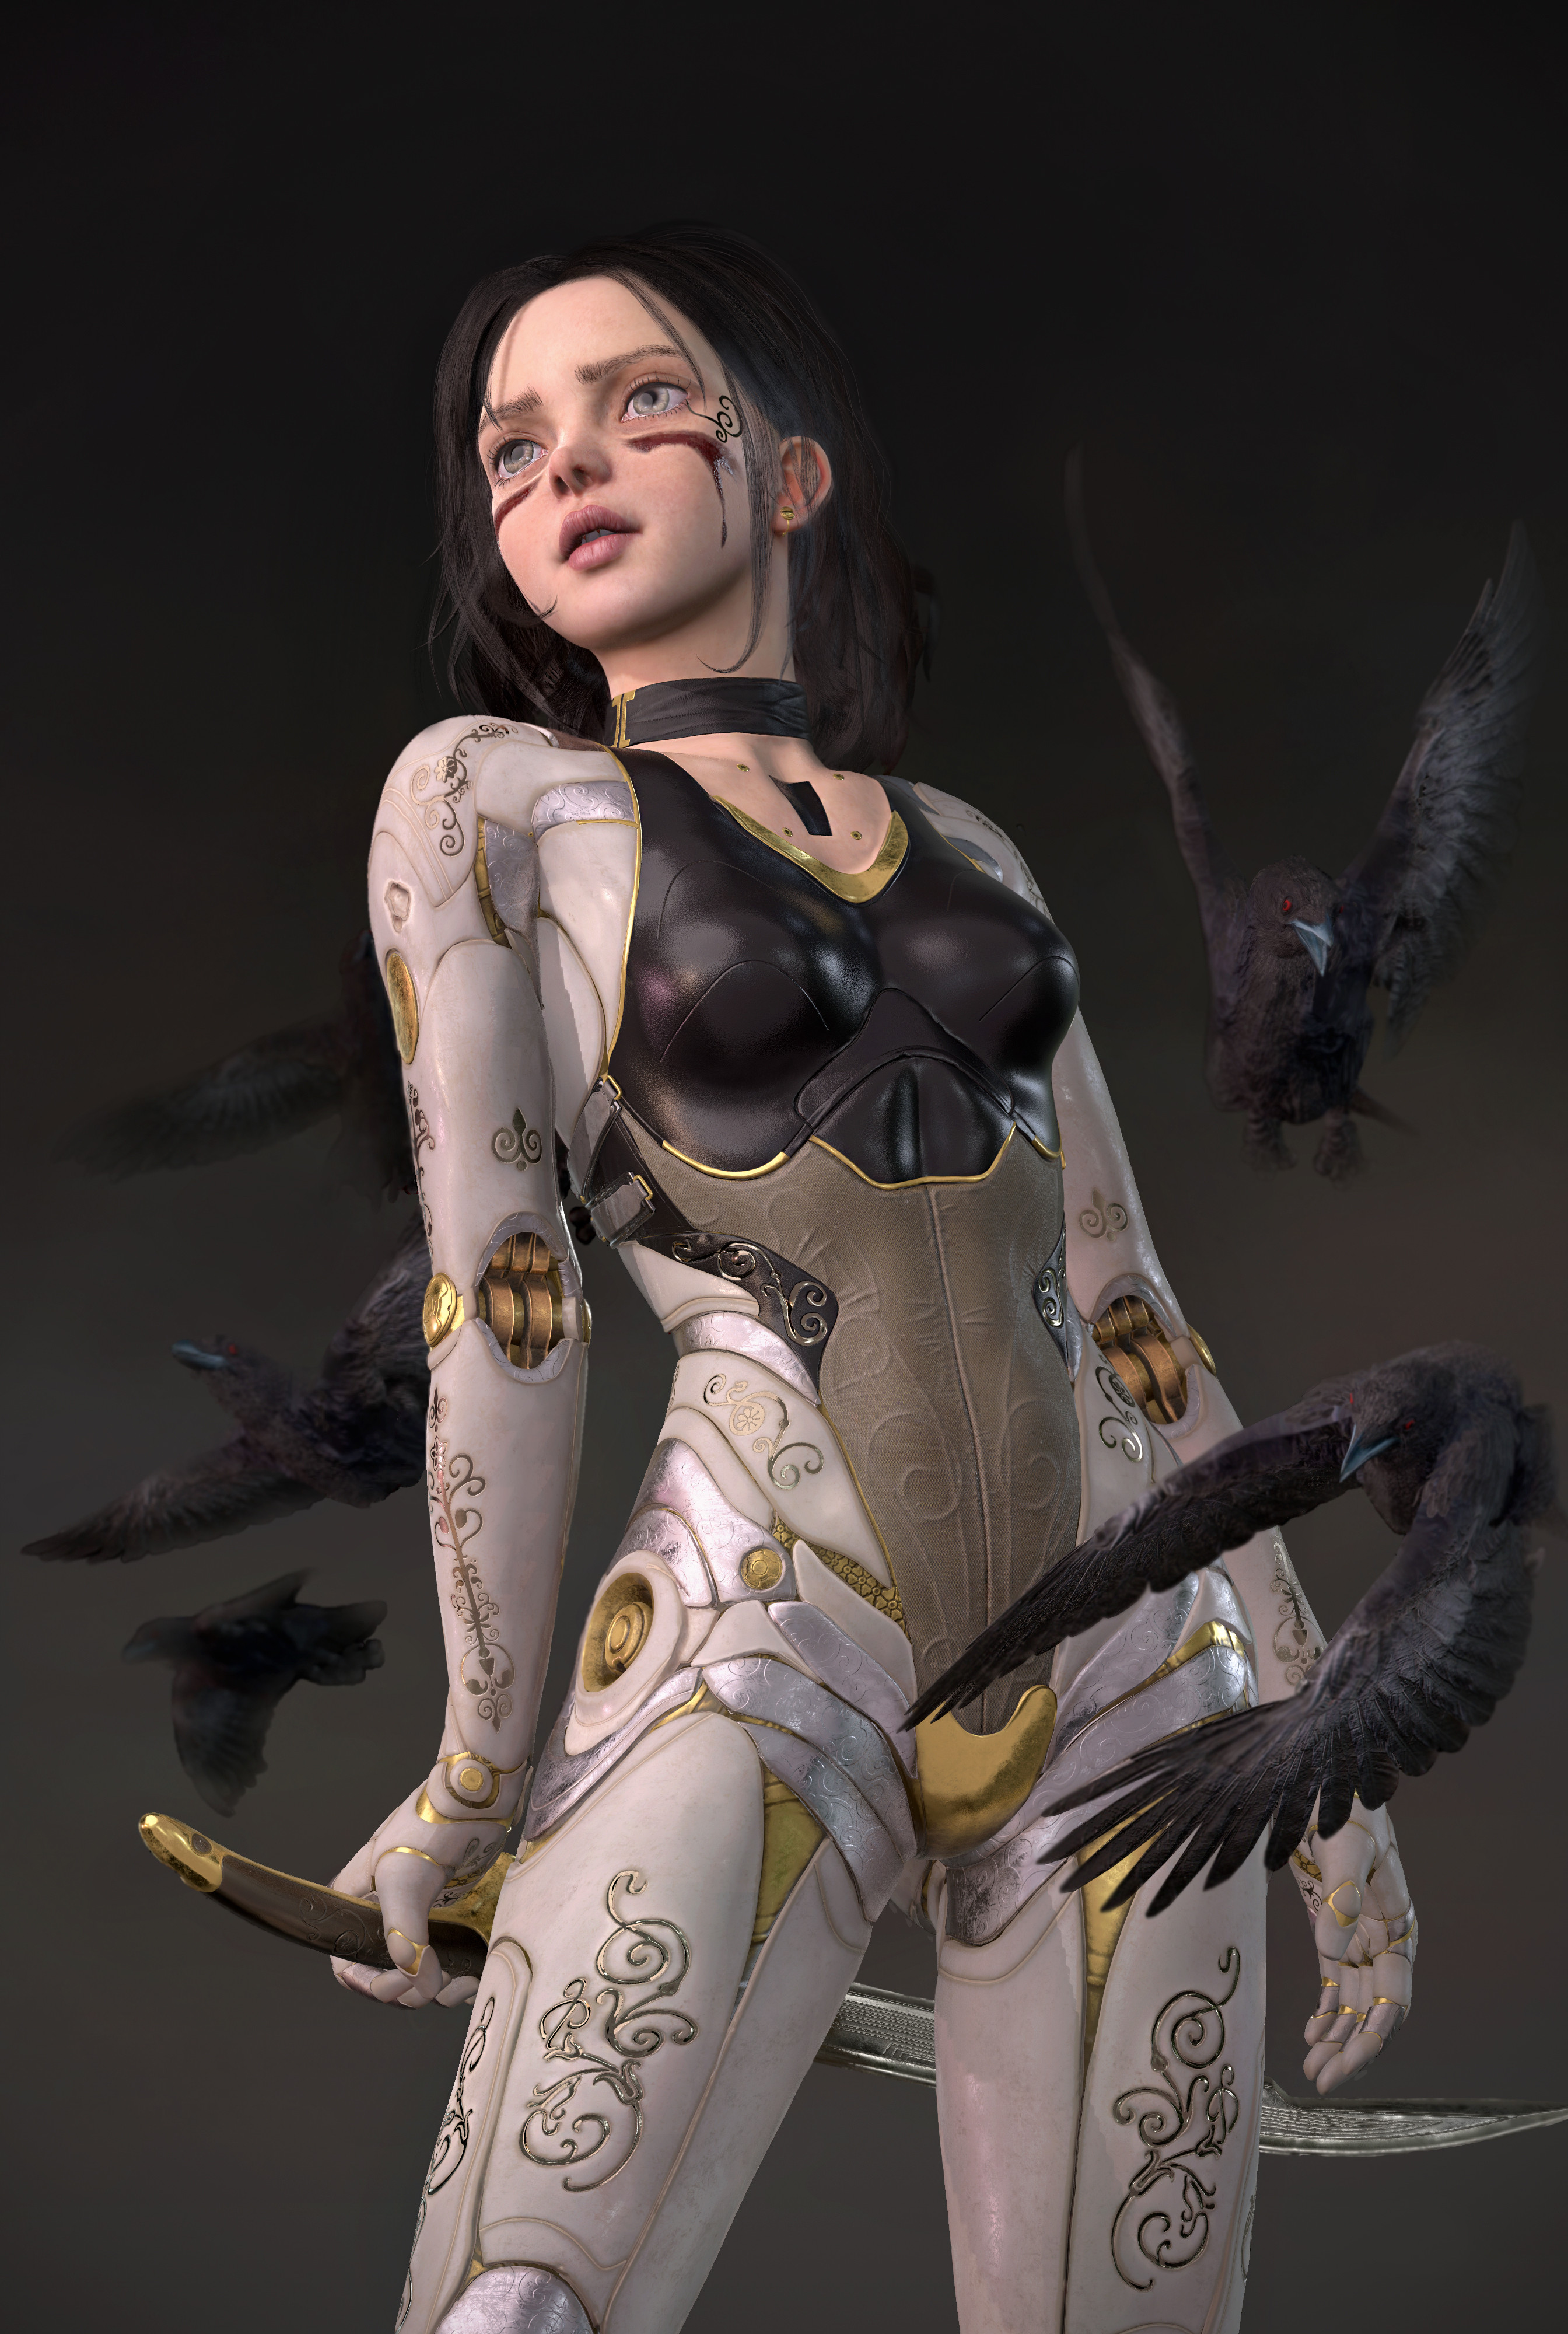 Andrea Savchenko Crow Raven Red Eyes Of Raven Portrait Display Digital Art Women Short Hair White Ey 2688x4000